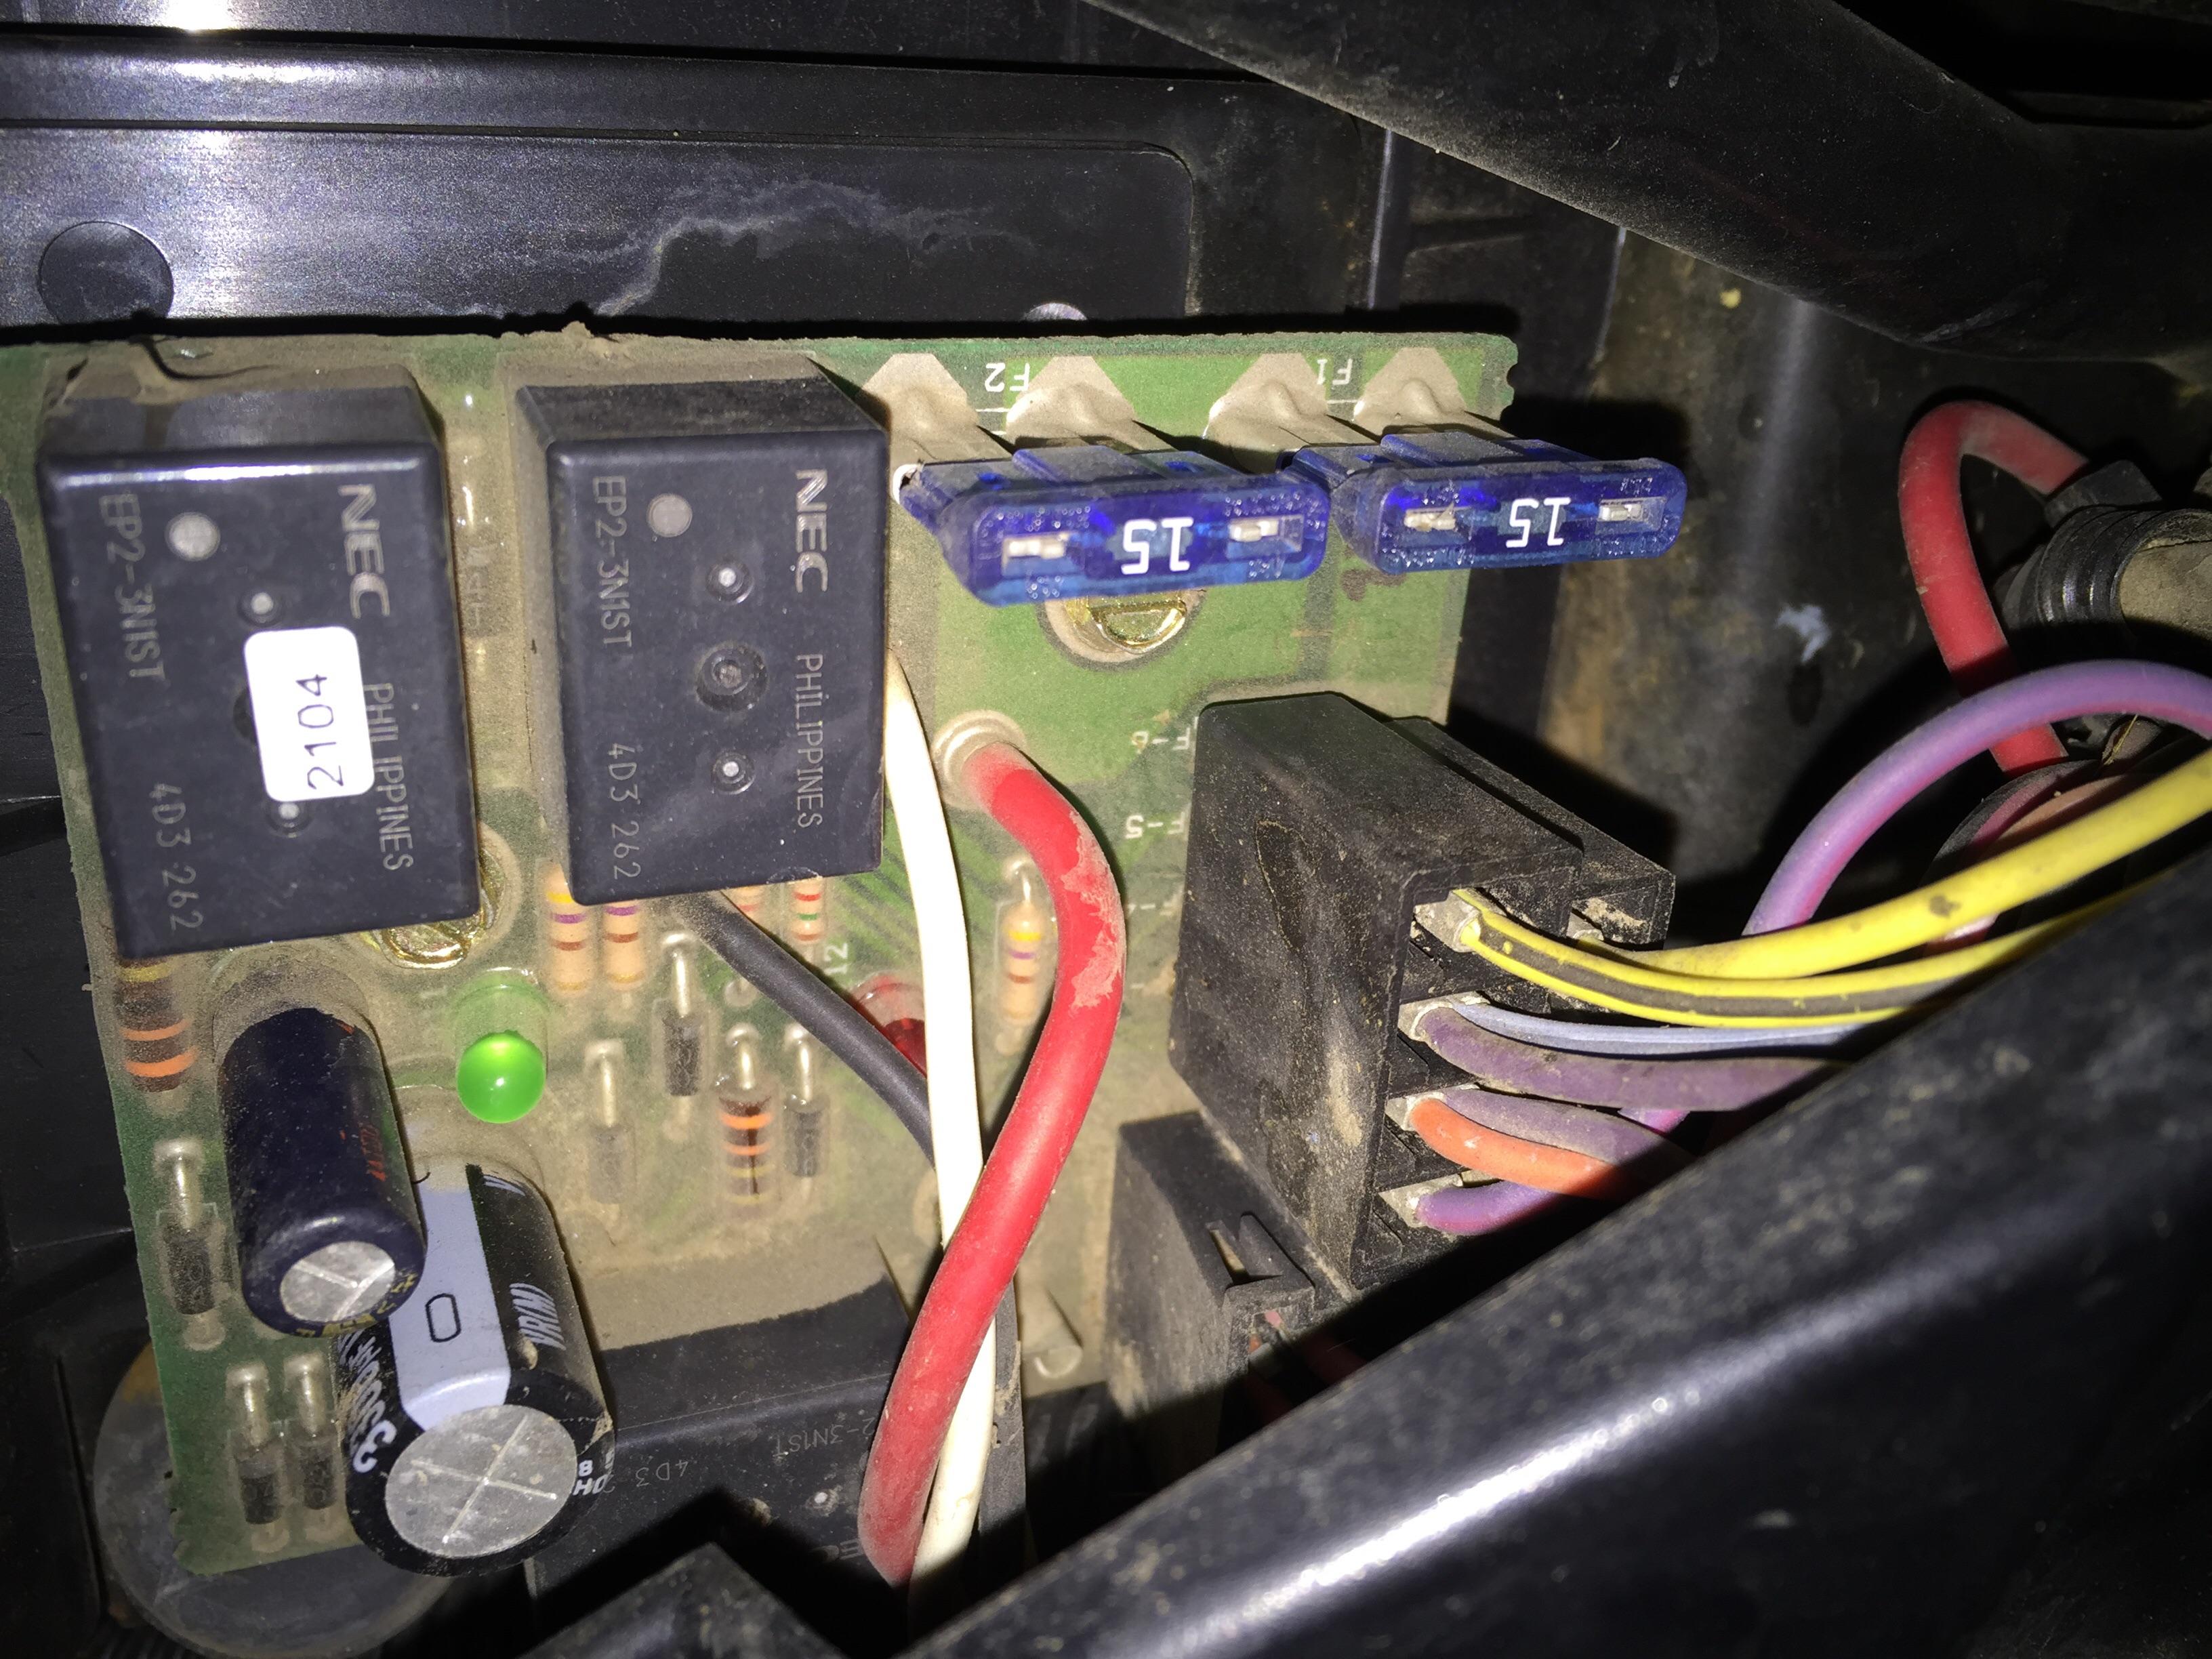 Need a 345 wiring diagram .pdf please | My Tractor Forum John Deere Lx Wiring Schematic on john deere gt275 wiring schematic, john deere lx173 wiring schematic, john deere z225 wiring schematic, john deere la145 wiring schematic, john deere f725 wiring schematic, john deere g100 wiring schematic, john deere sx85 wiring schematic, john deere x700 wiring schematic, john deere stx30 wiring schematic, john deere lx255 wiring schematic, john deere la175 wiring schematic, john deere stx38 wiring schematic, john deere rx75 wiring schematic, john deere l111 wiring schematic, john deere 260 wiring schematic, john deere x324 wiring schematic, john deere gx345 wiring schematic, john deere lx176 wiring schematic, john deere x500 wiring schematic, john deere x300 wiring schematic,